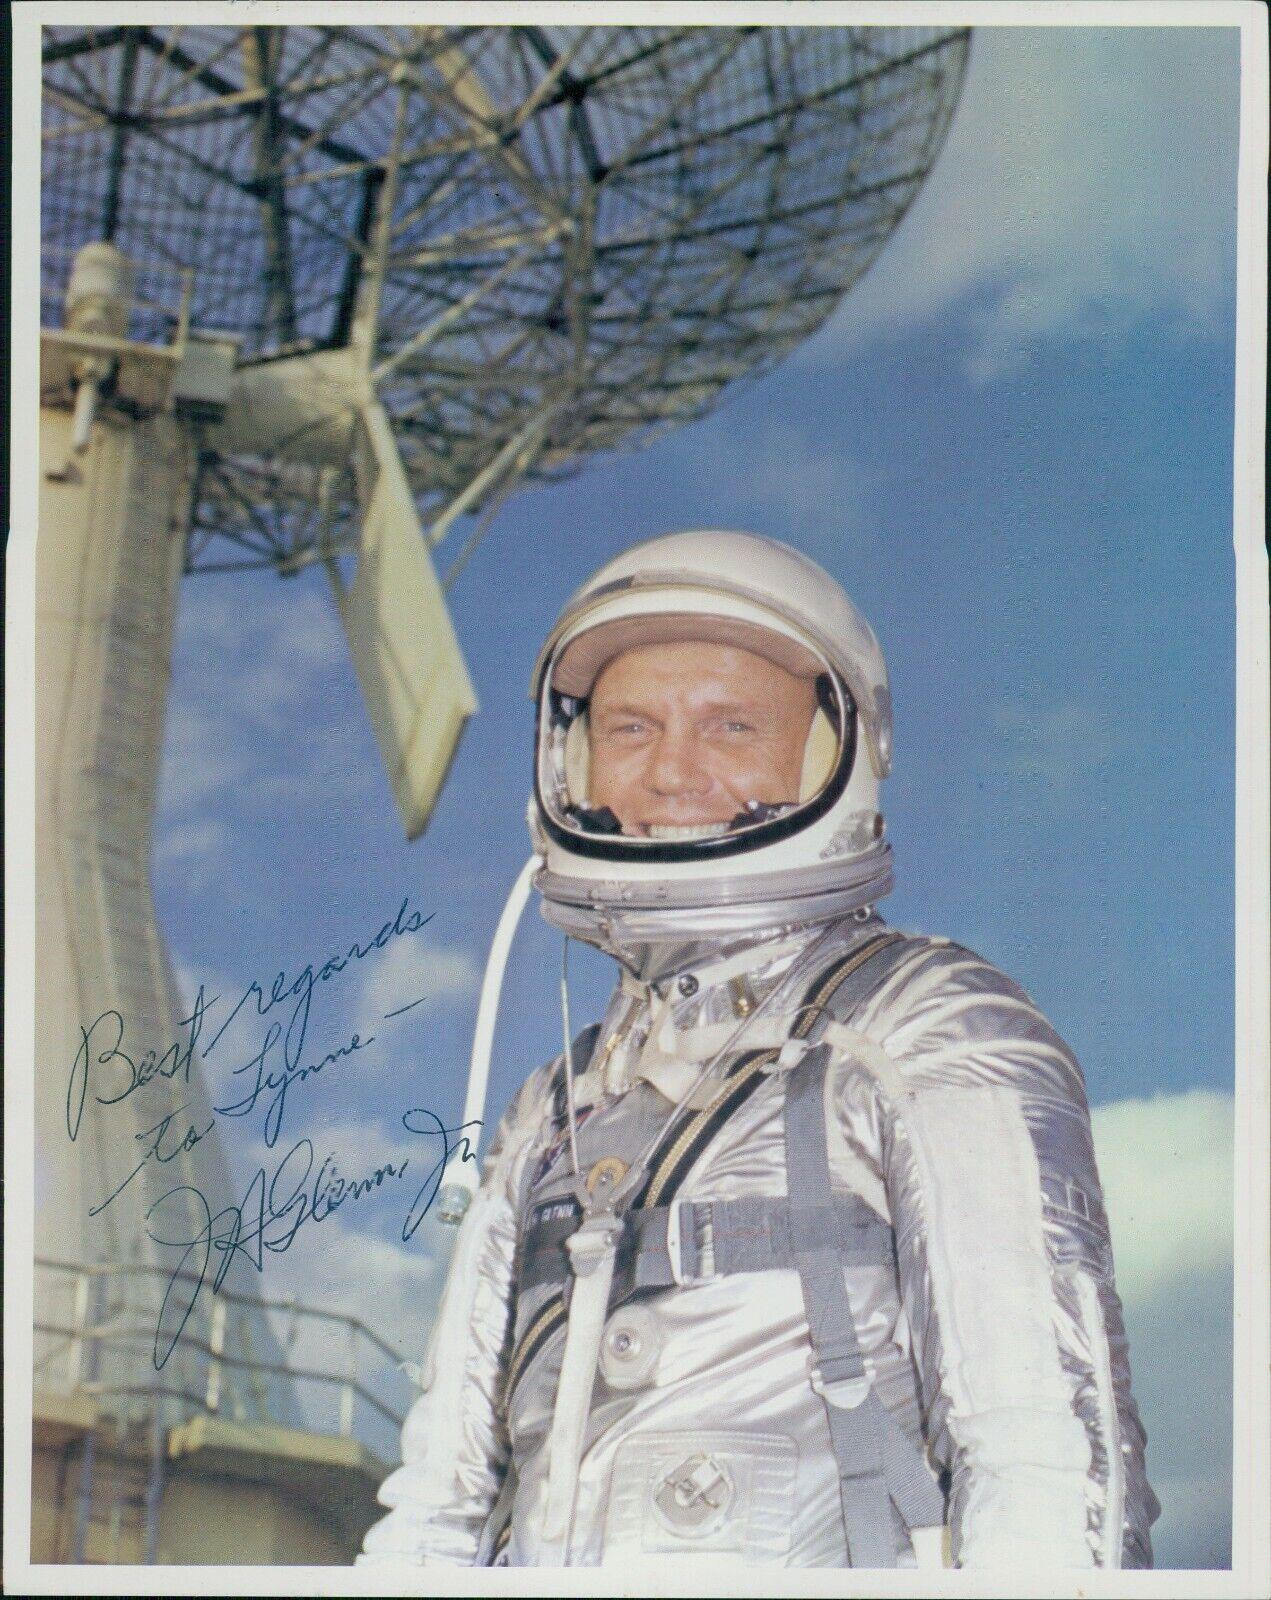 s l1600 - John Glenn Astronaut Signed Personalized 8x10 Photo JSA Authenticated